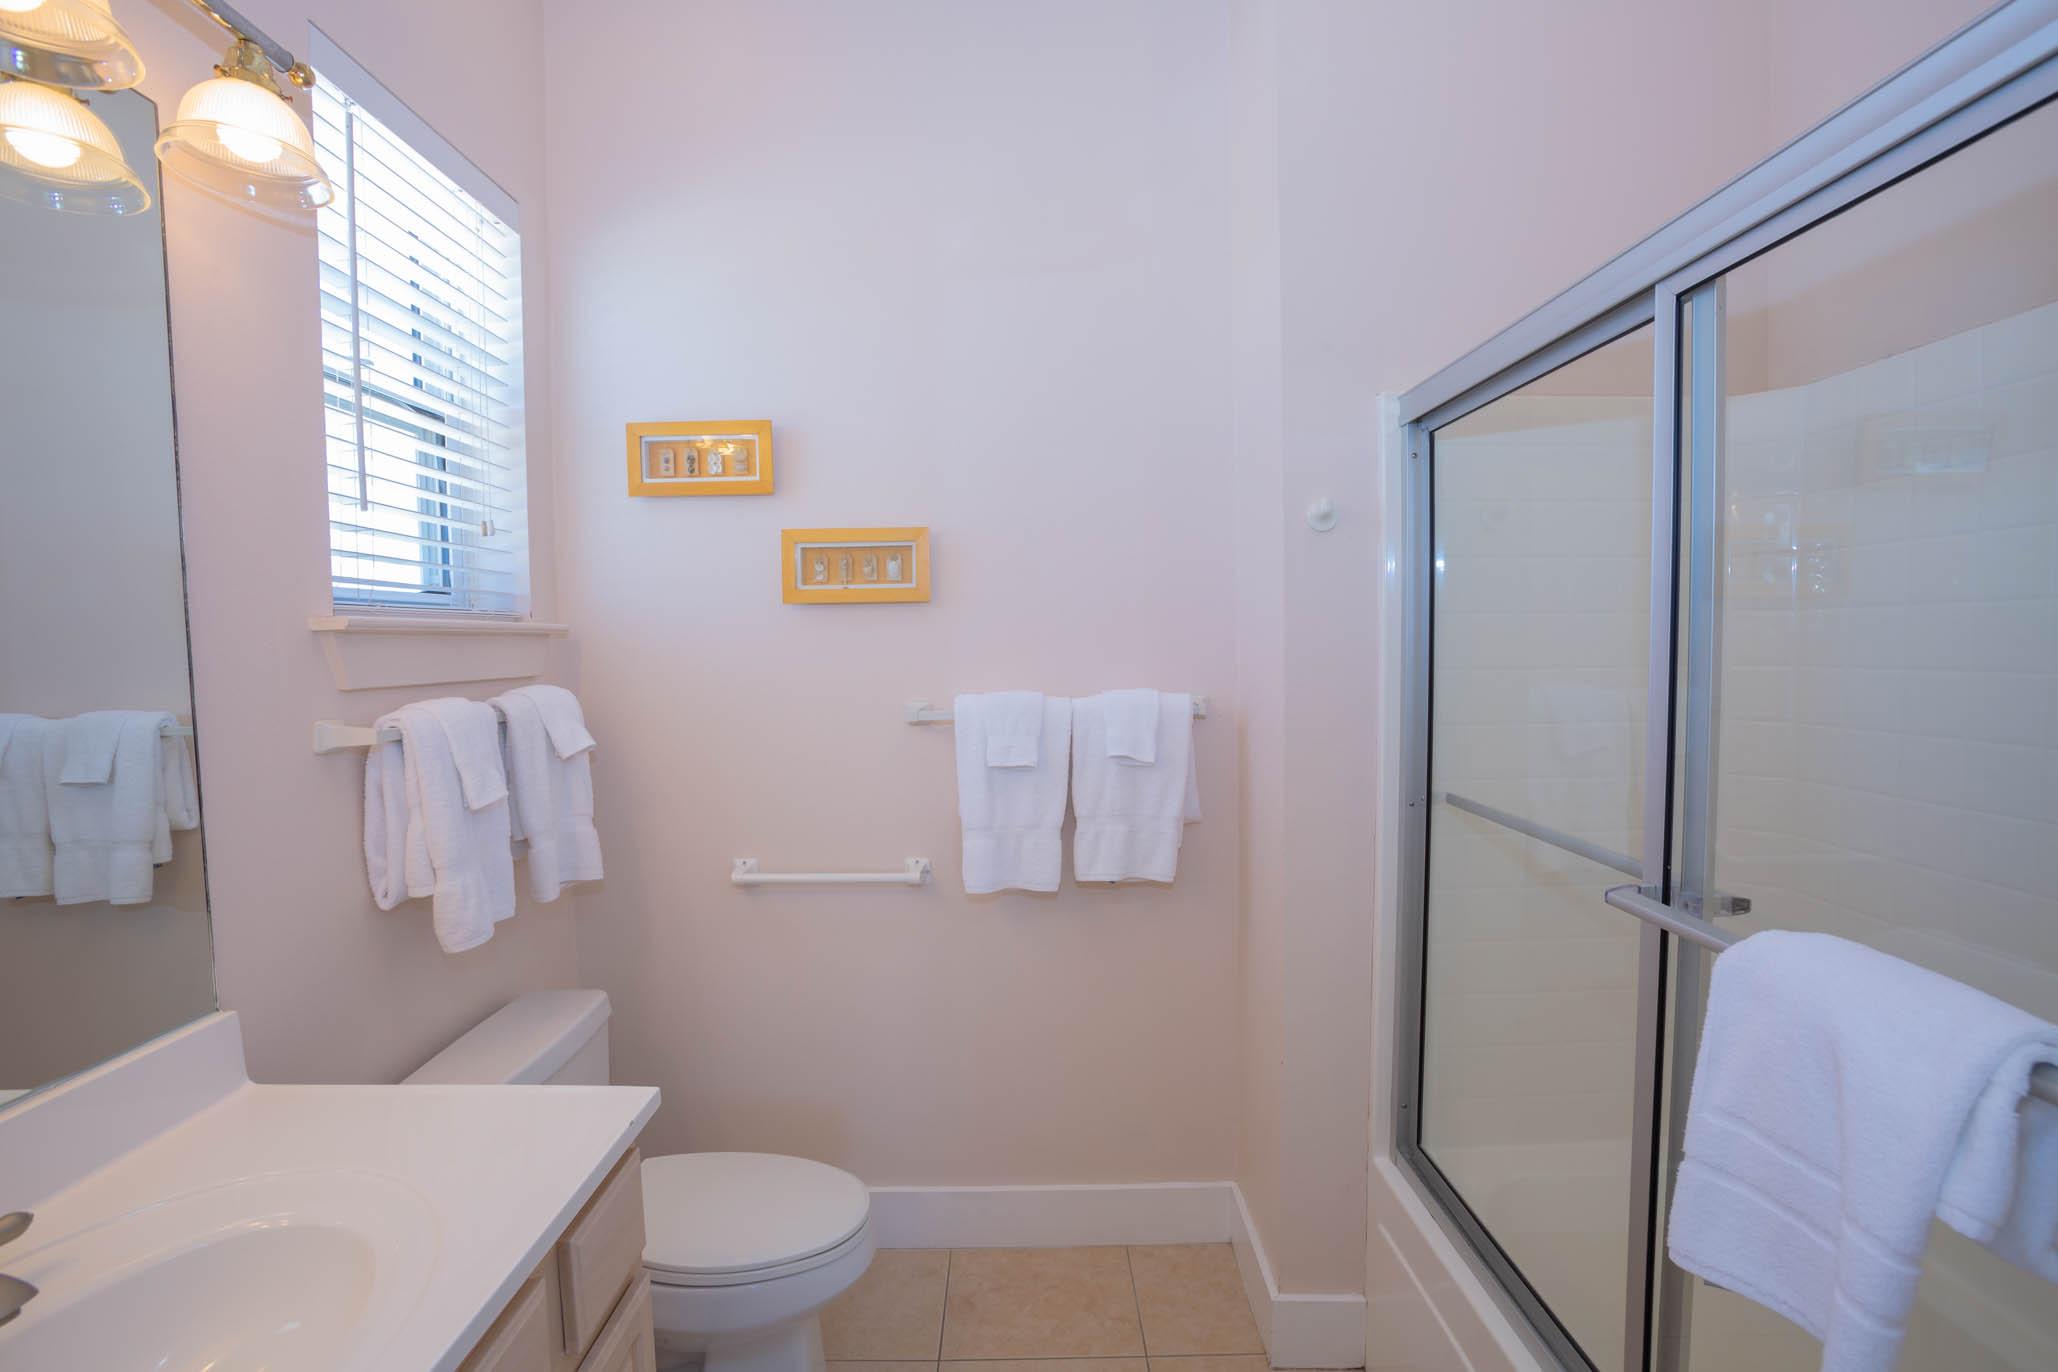 Ariola 1214 House/Cottage rental in Luxury Homes in Pensacola Beach Florida - #25